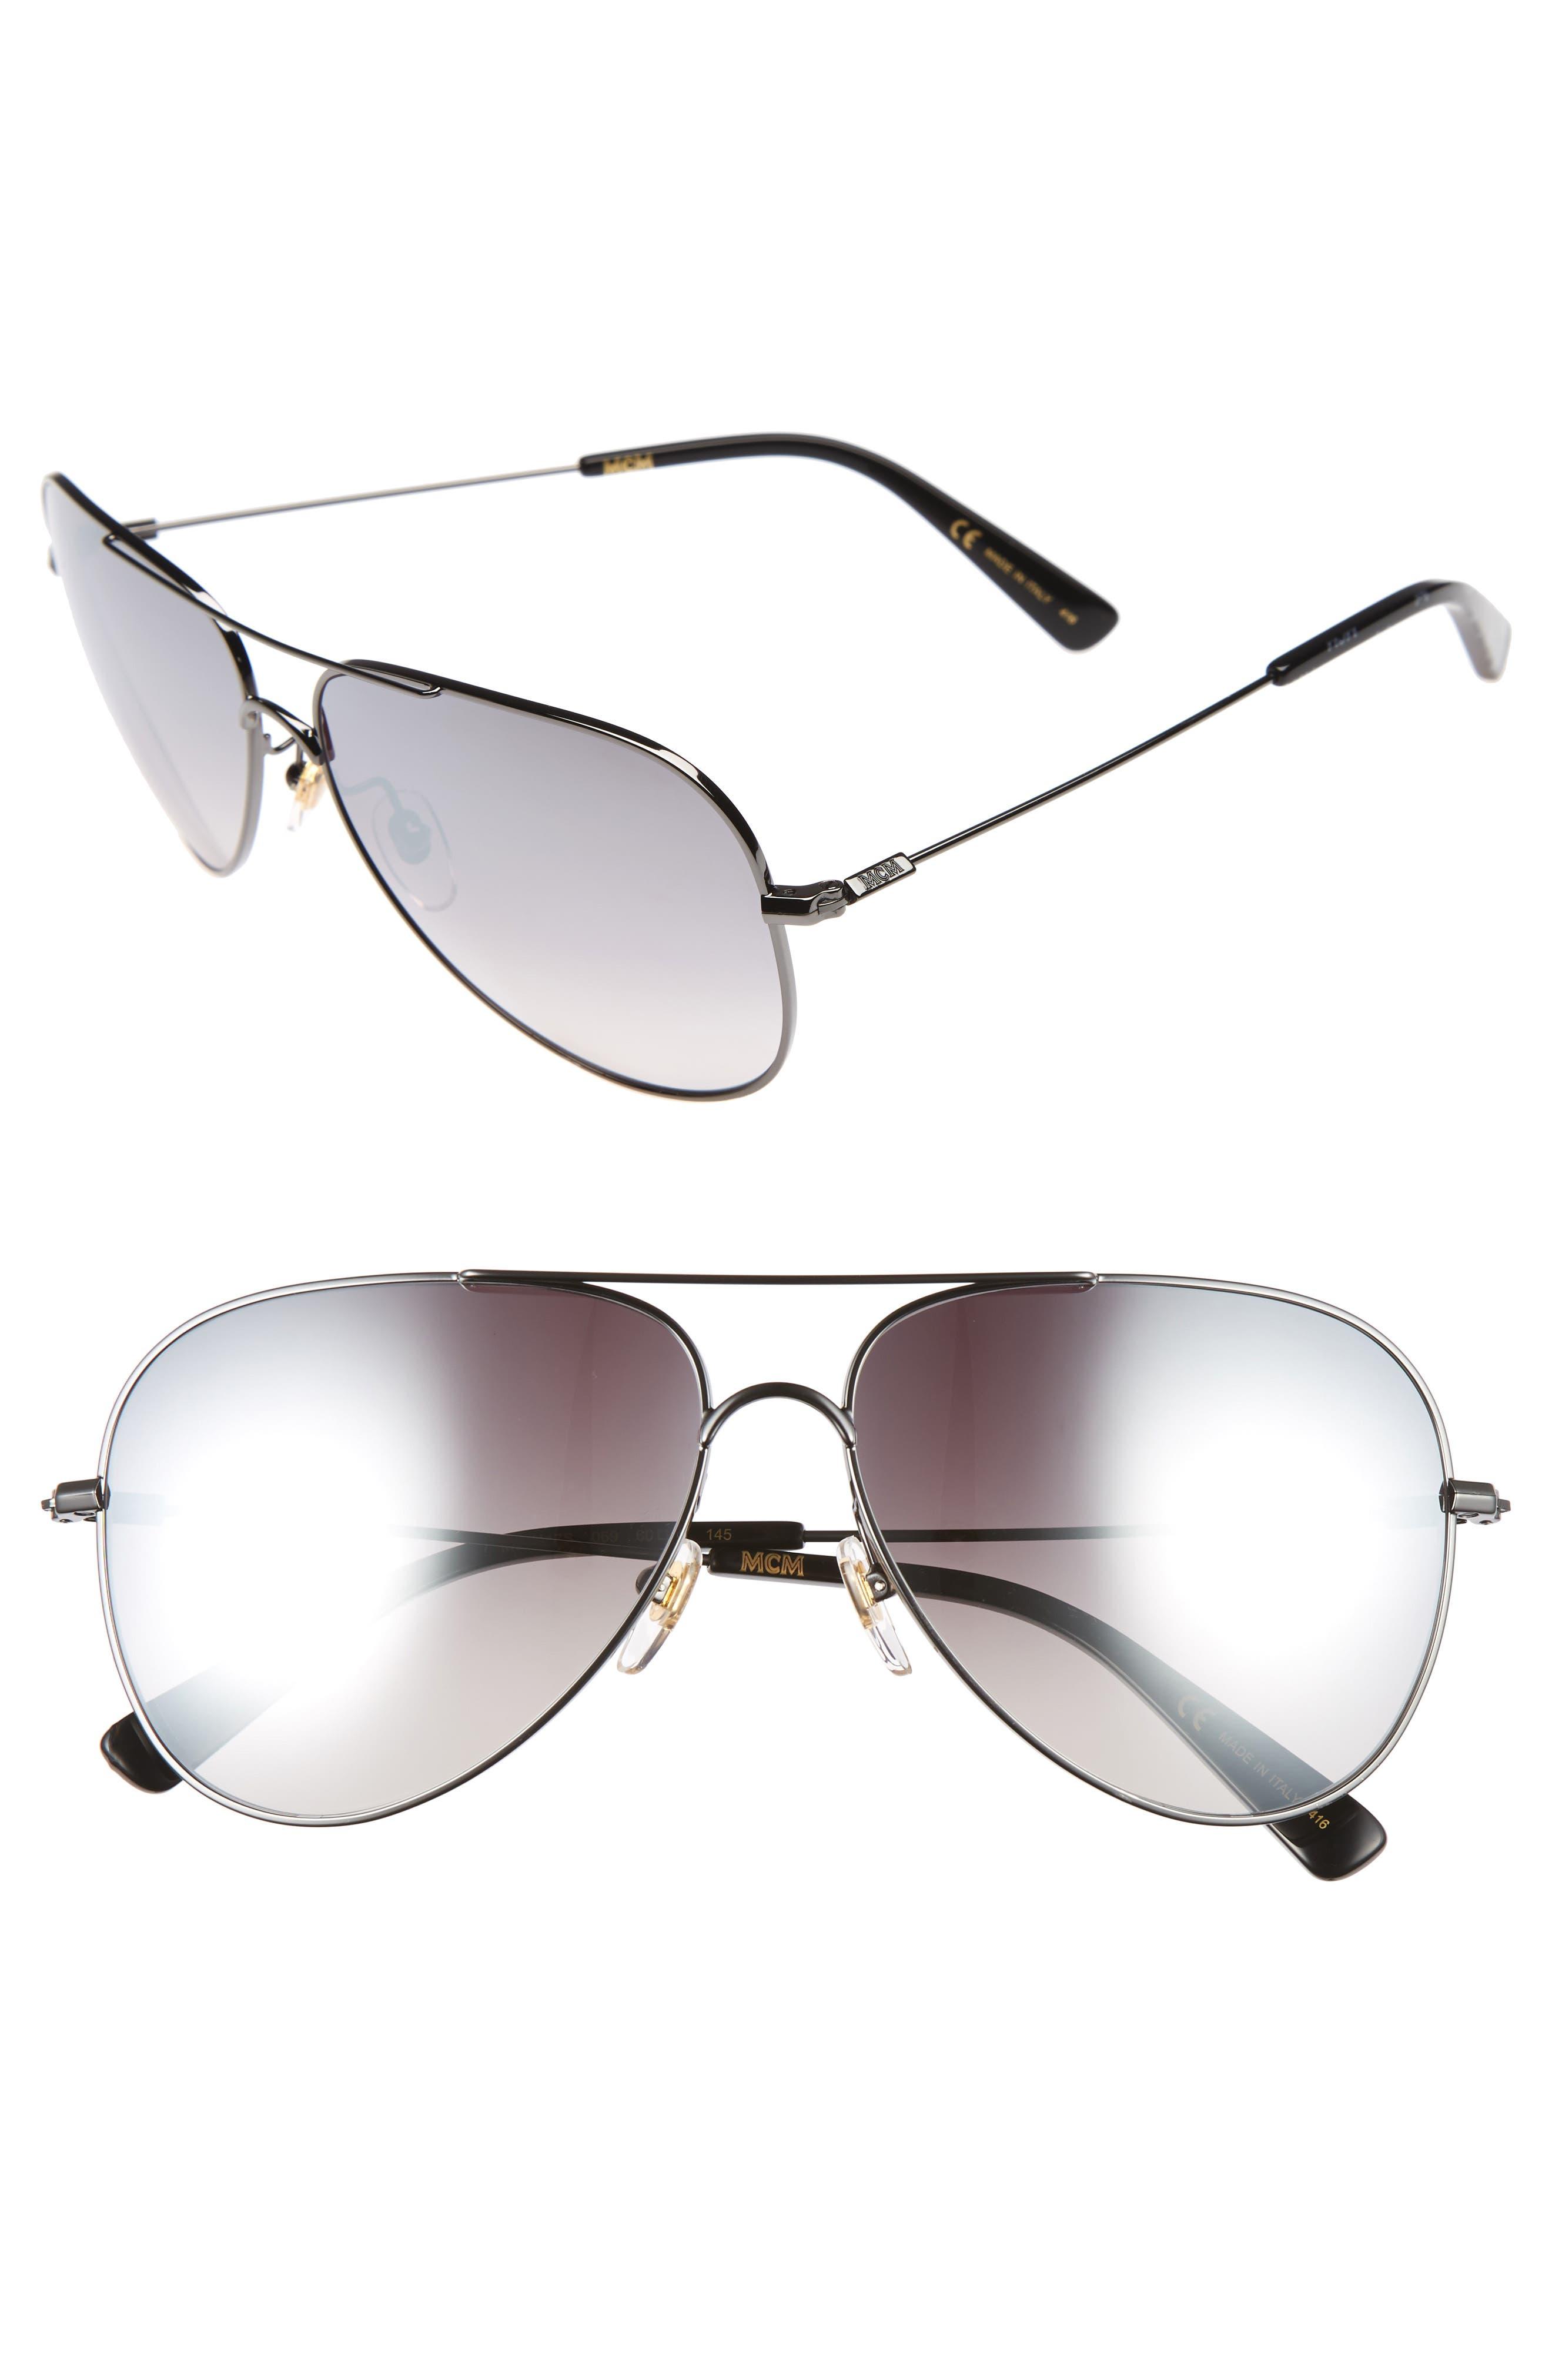 60mm Aviator Sunglasses,                         Main,                         color, Dark Ruthenium